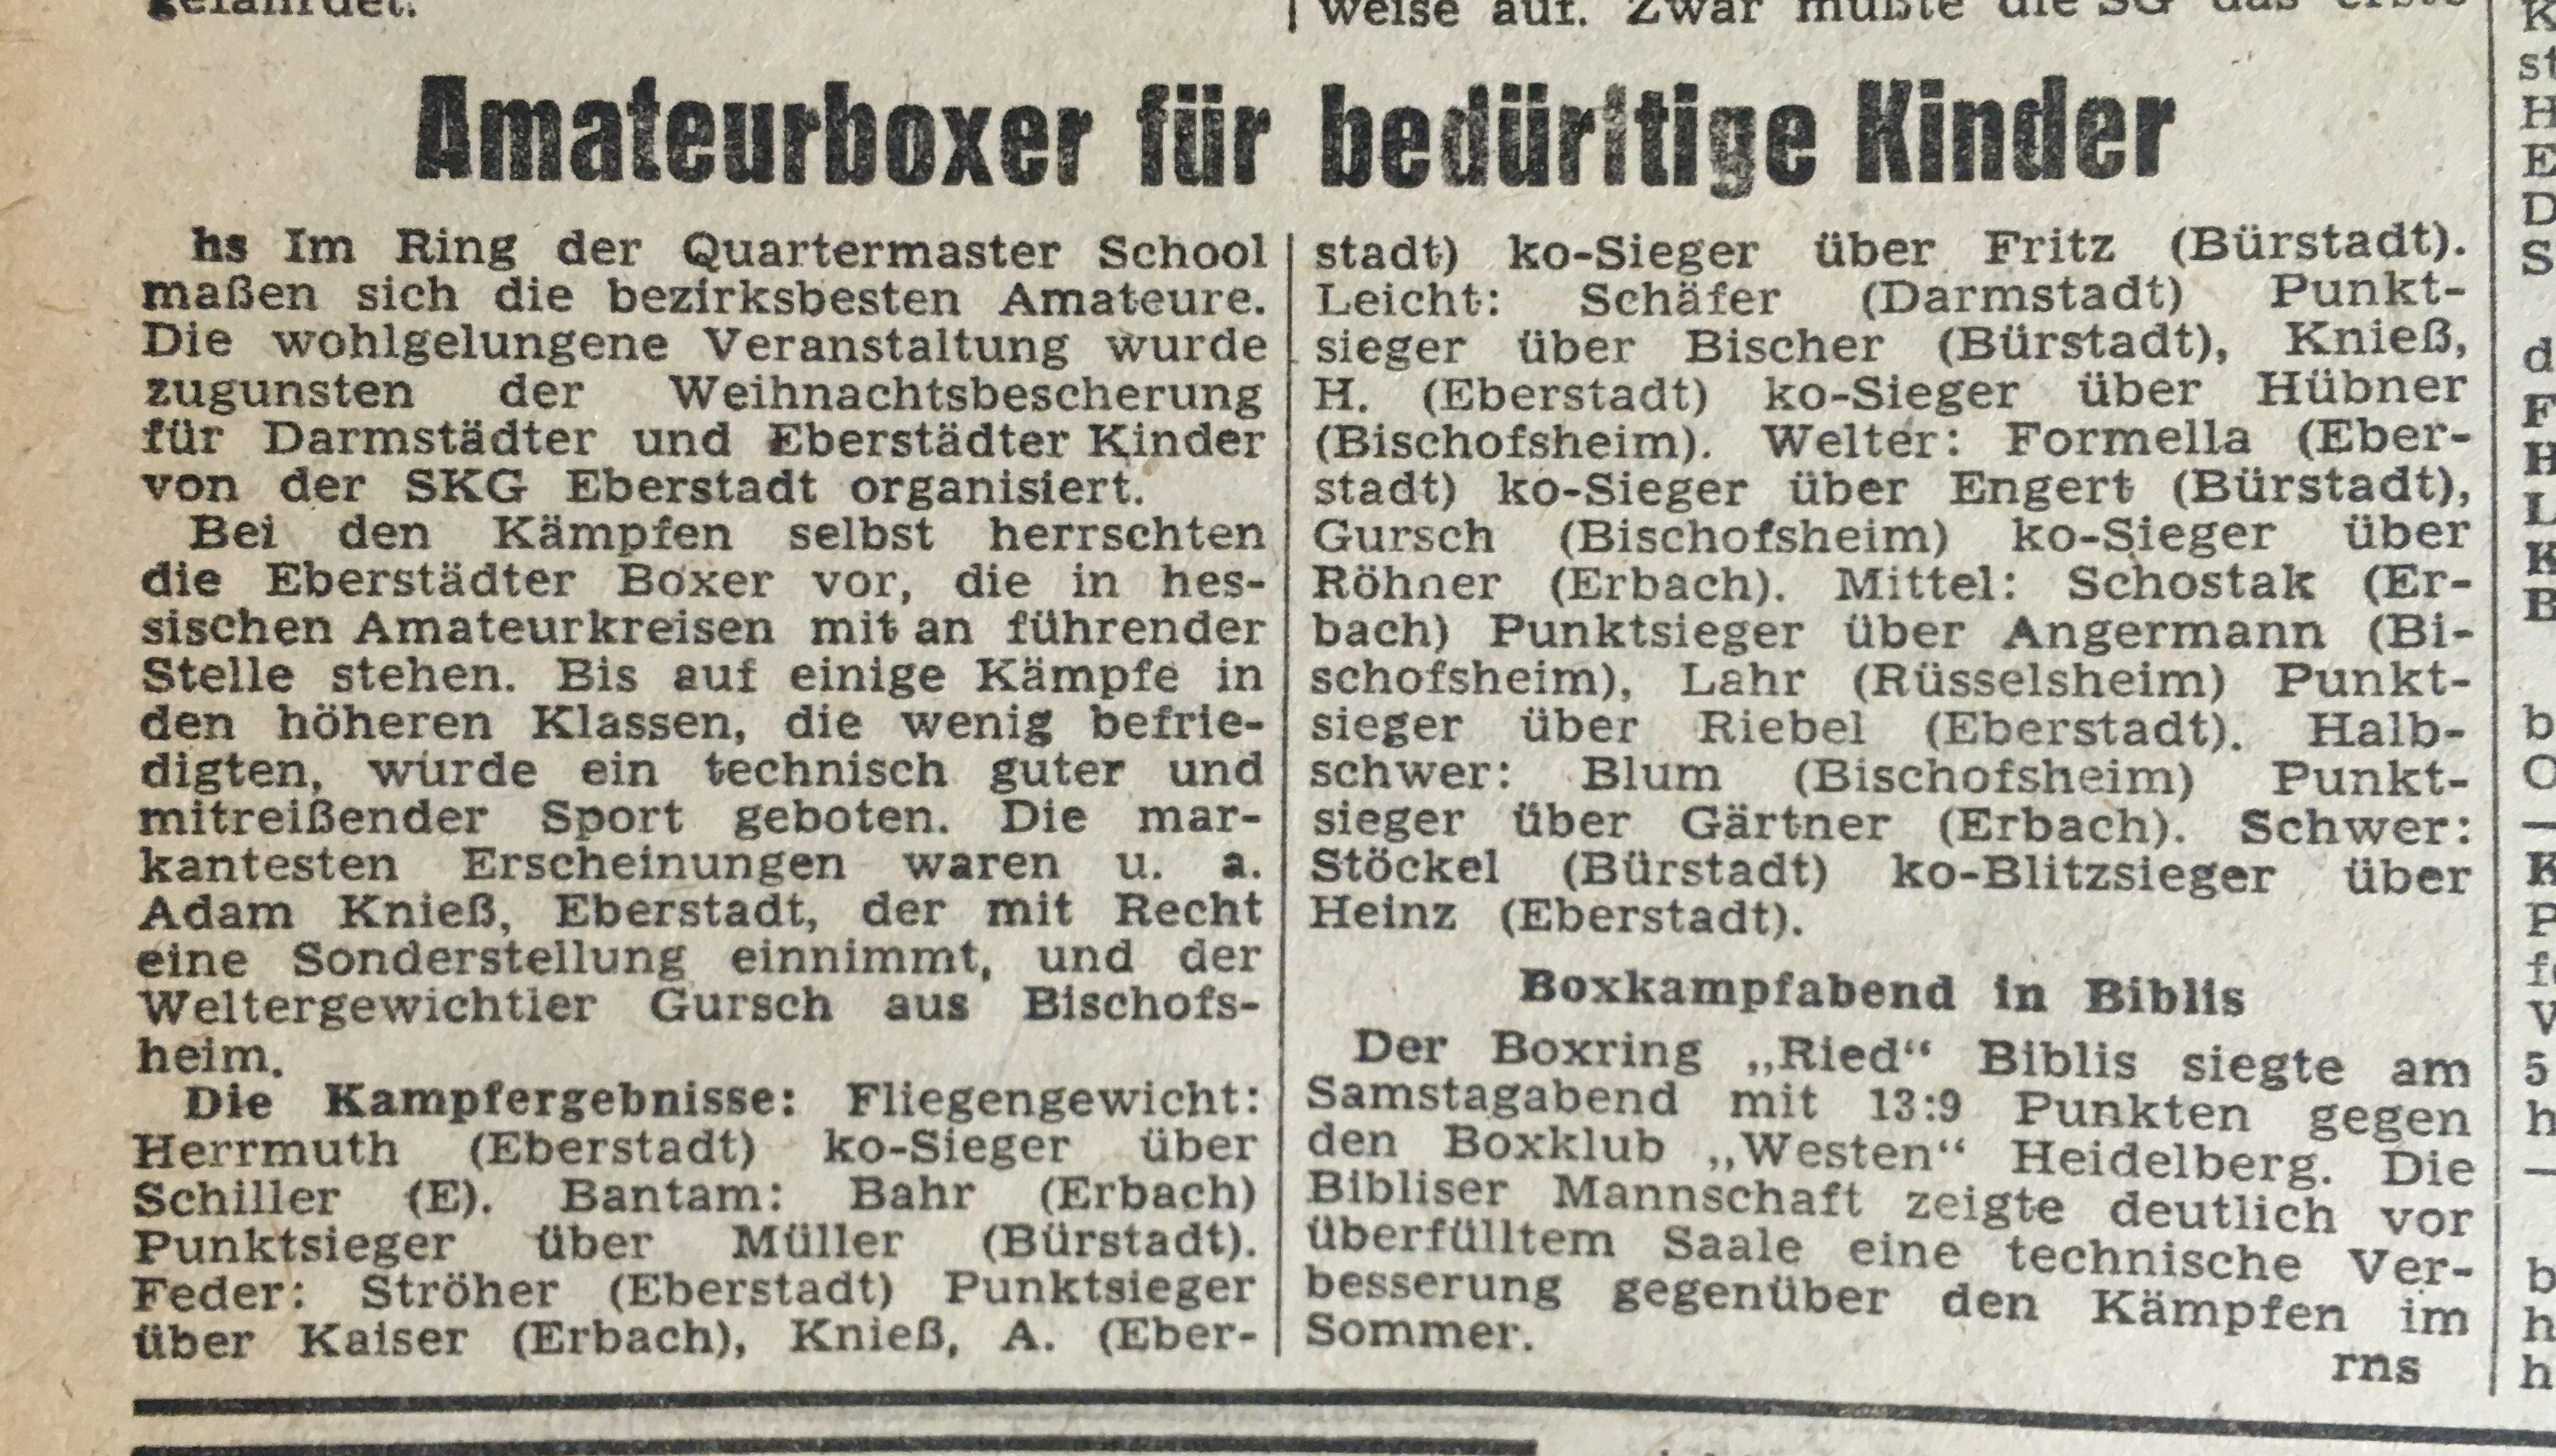 Darmstädter Echo vom 09. Dezember 1947, StadtA DA Bibl. Z 10, 1947